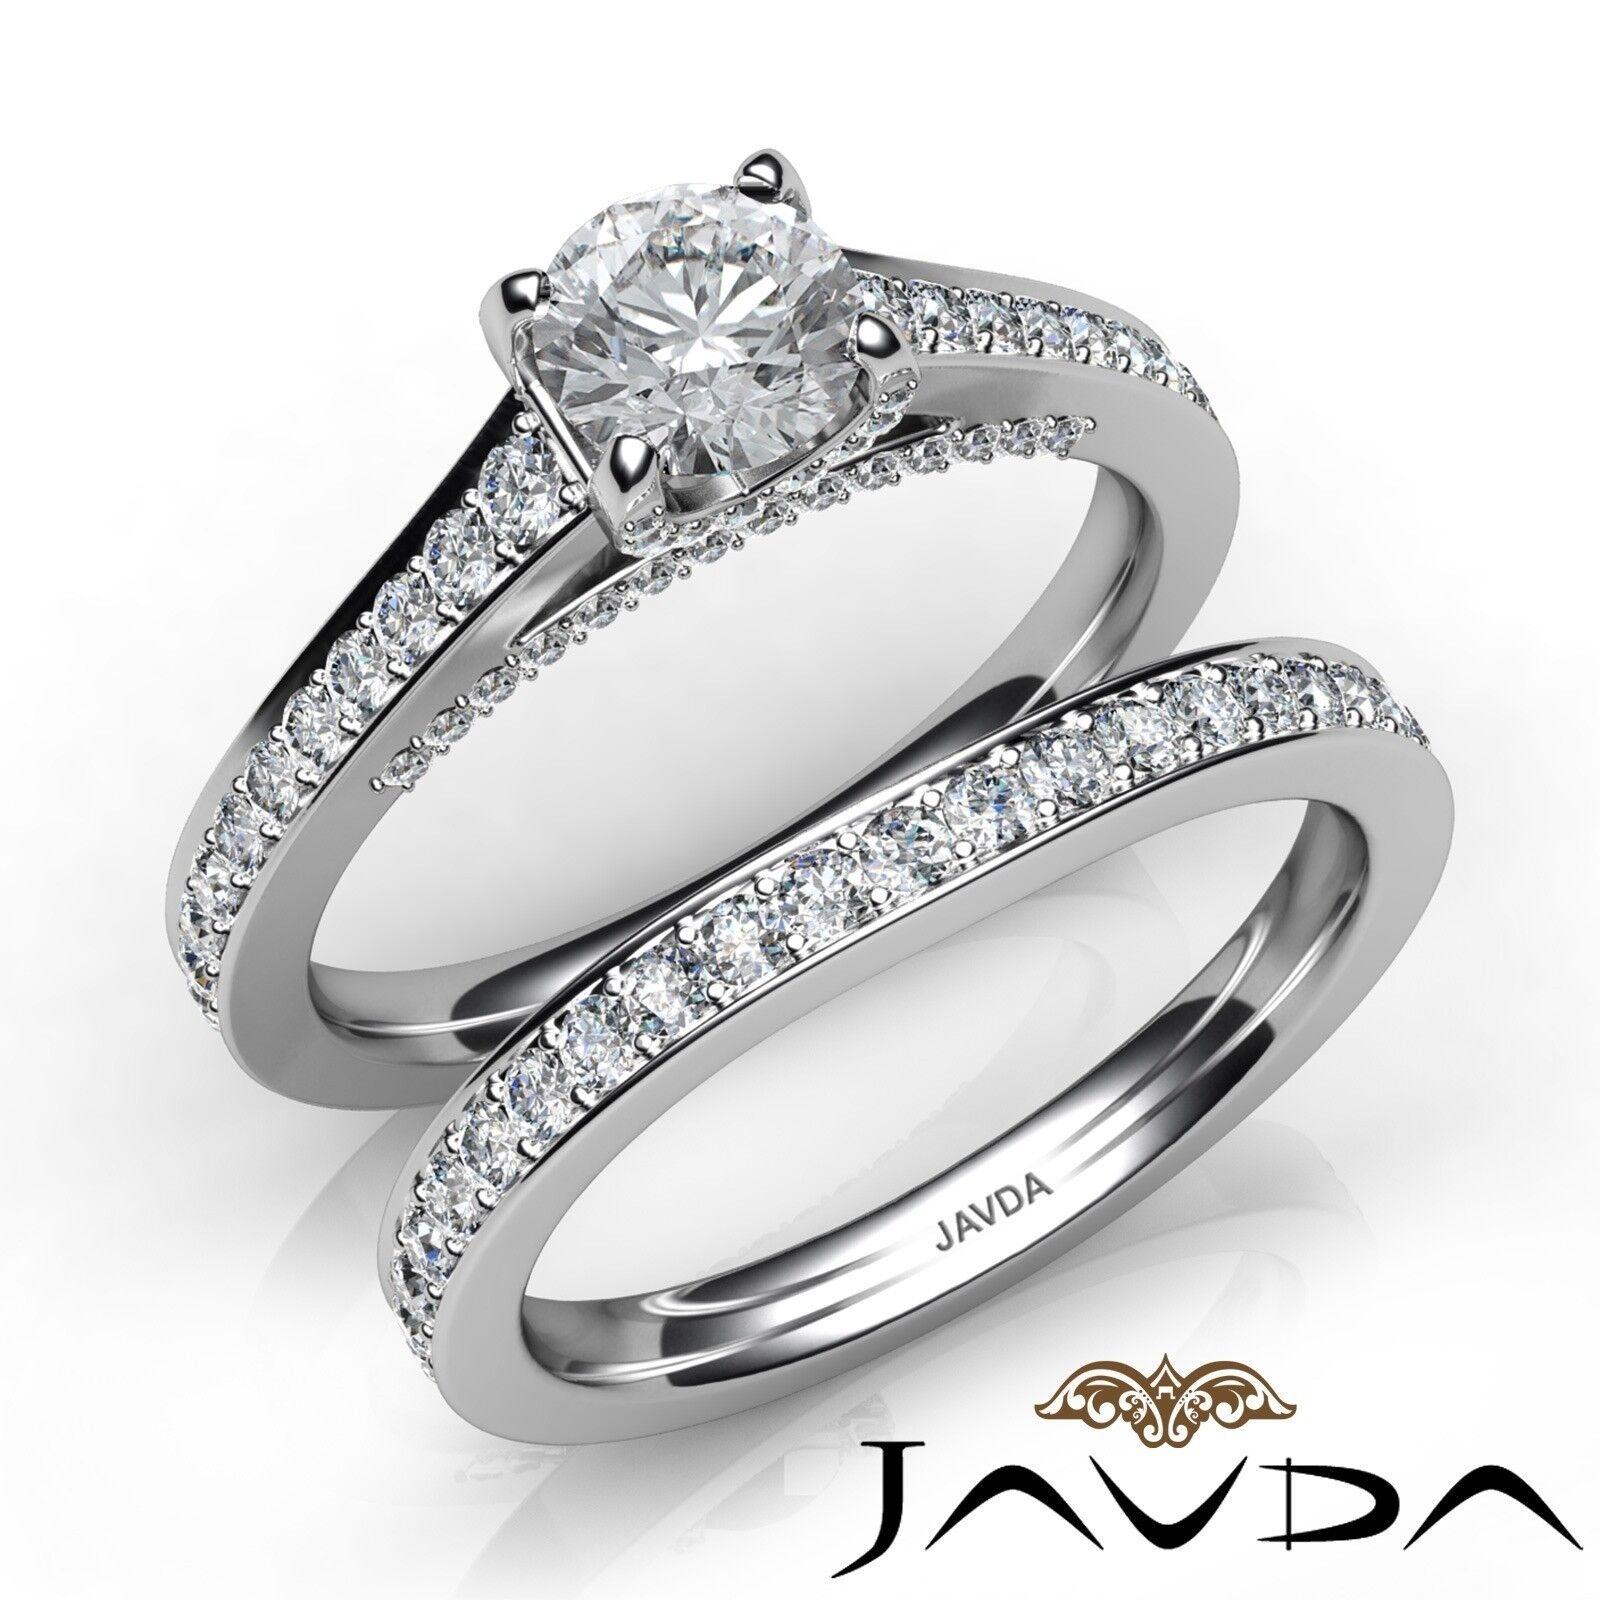 1.75ctw Pave Classic Bridal Set Round Diamond Engagement Ring GIA F-VS2 W Gold